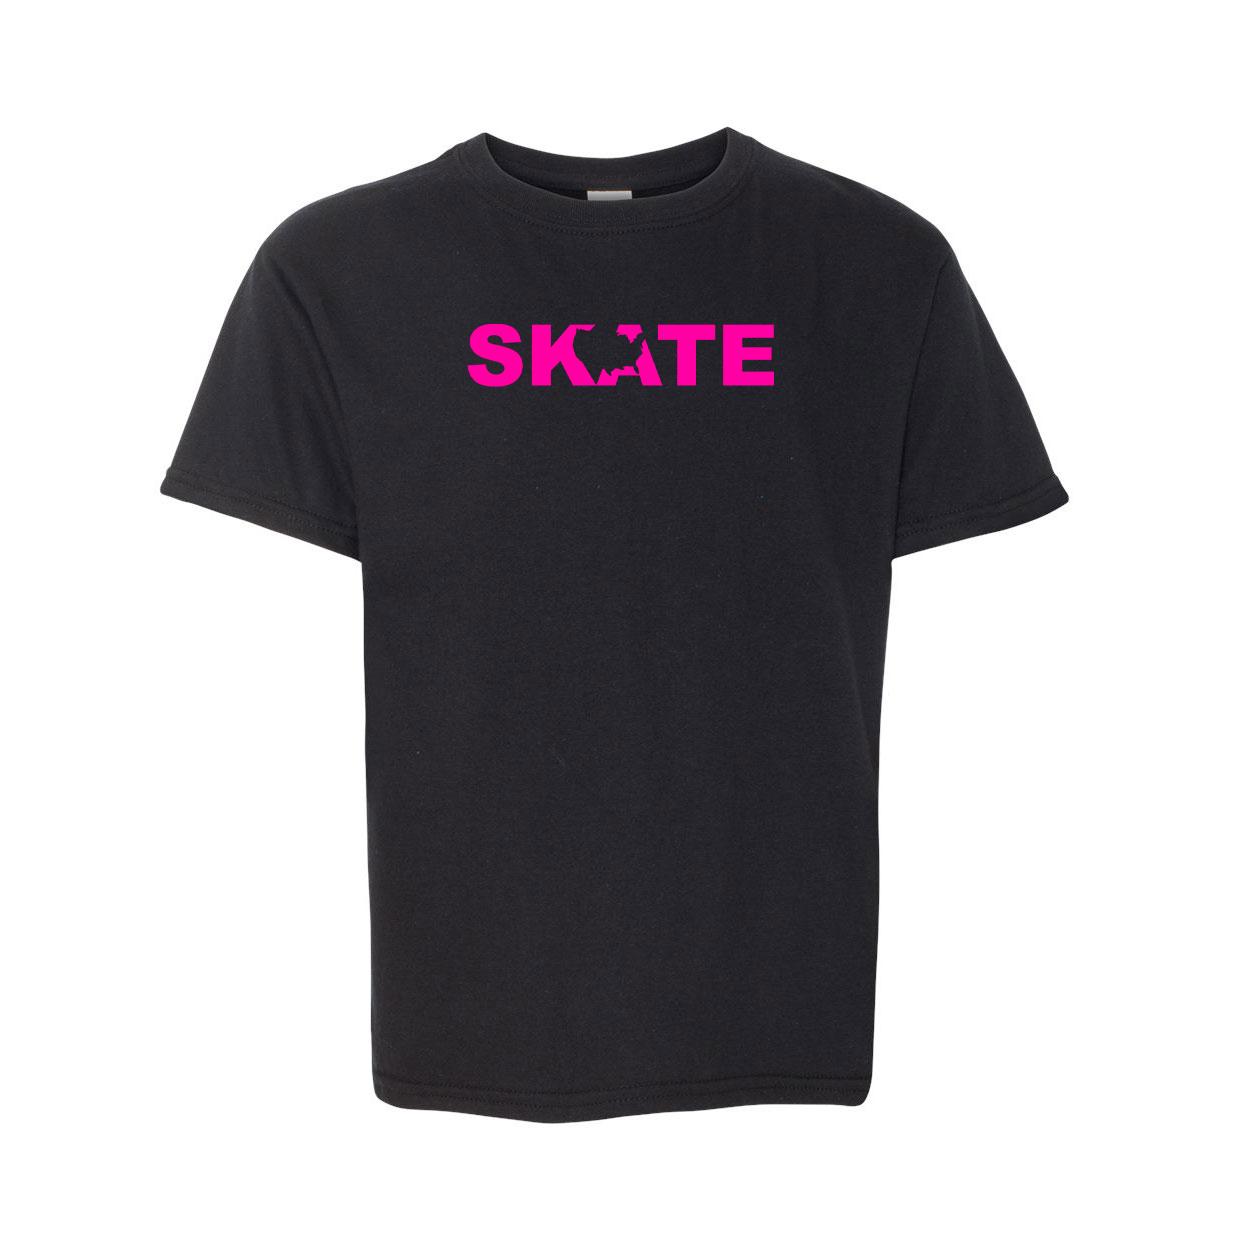 Skate United States Classic Youth T-Shirt Black (Pink Logo)